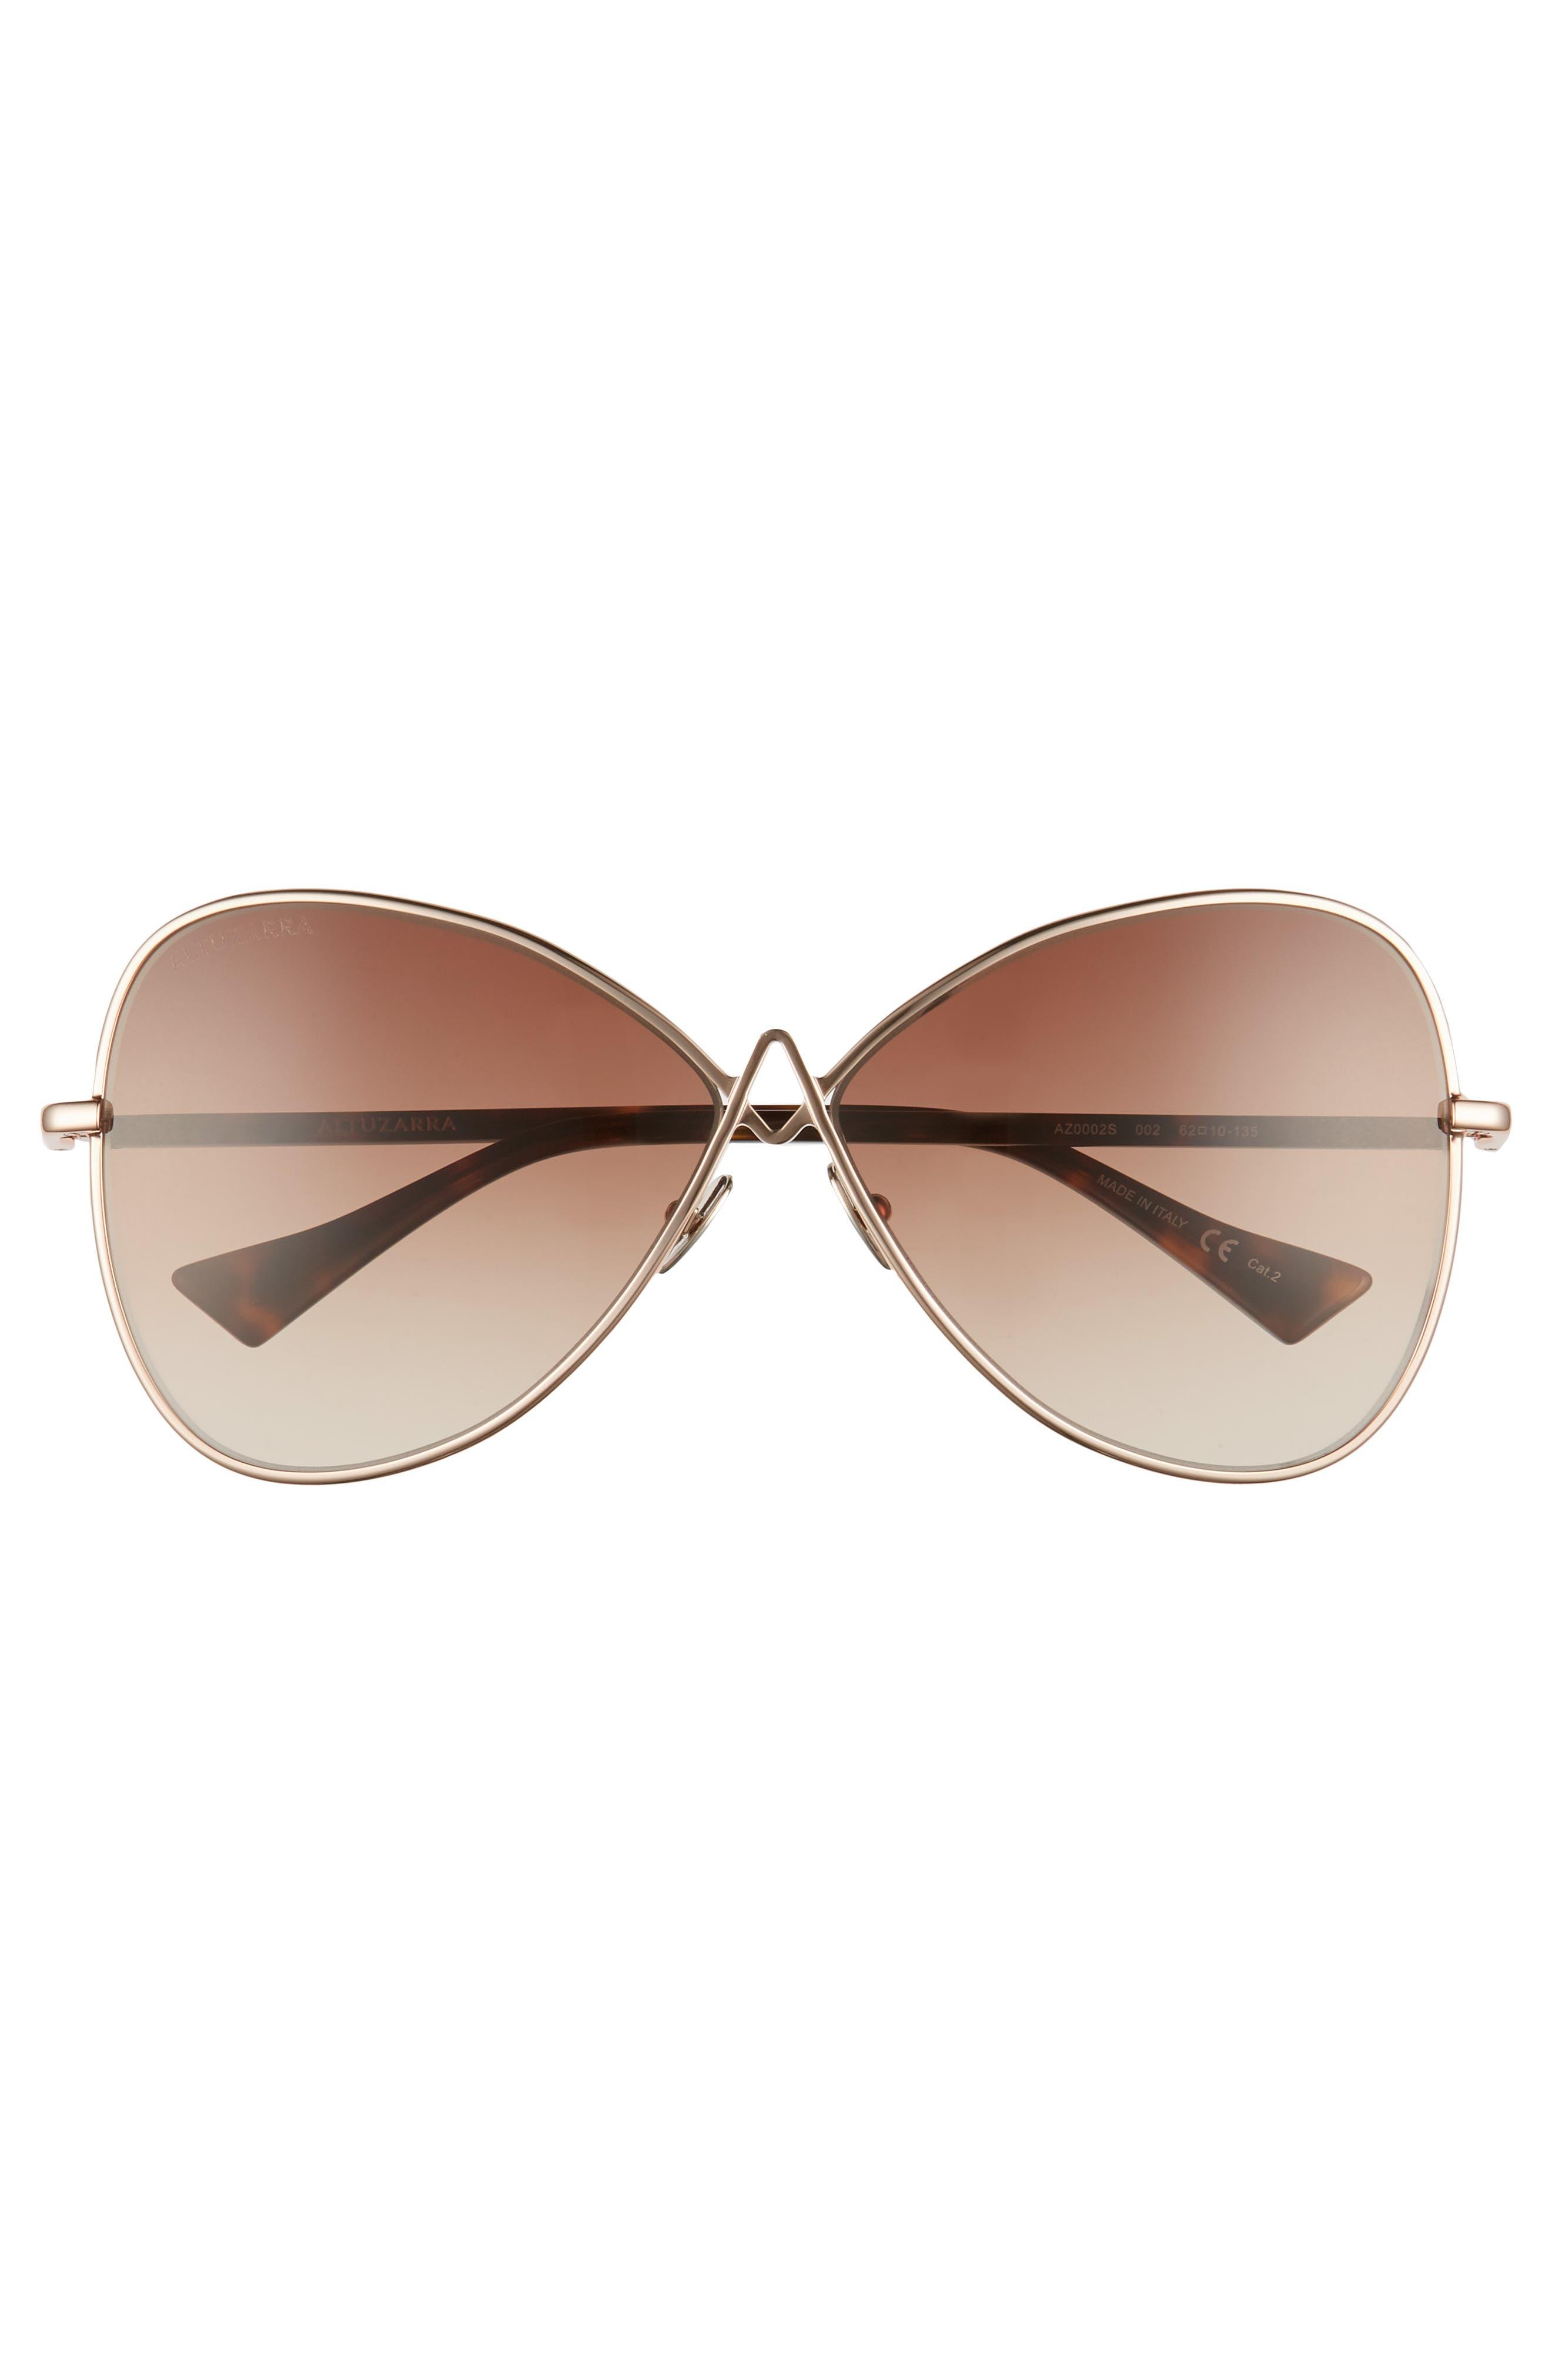 62mm Sunglasses,                             Alternate thumbnail 3, color,                             Rose Gold